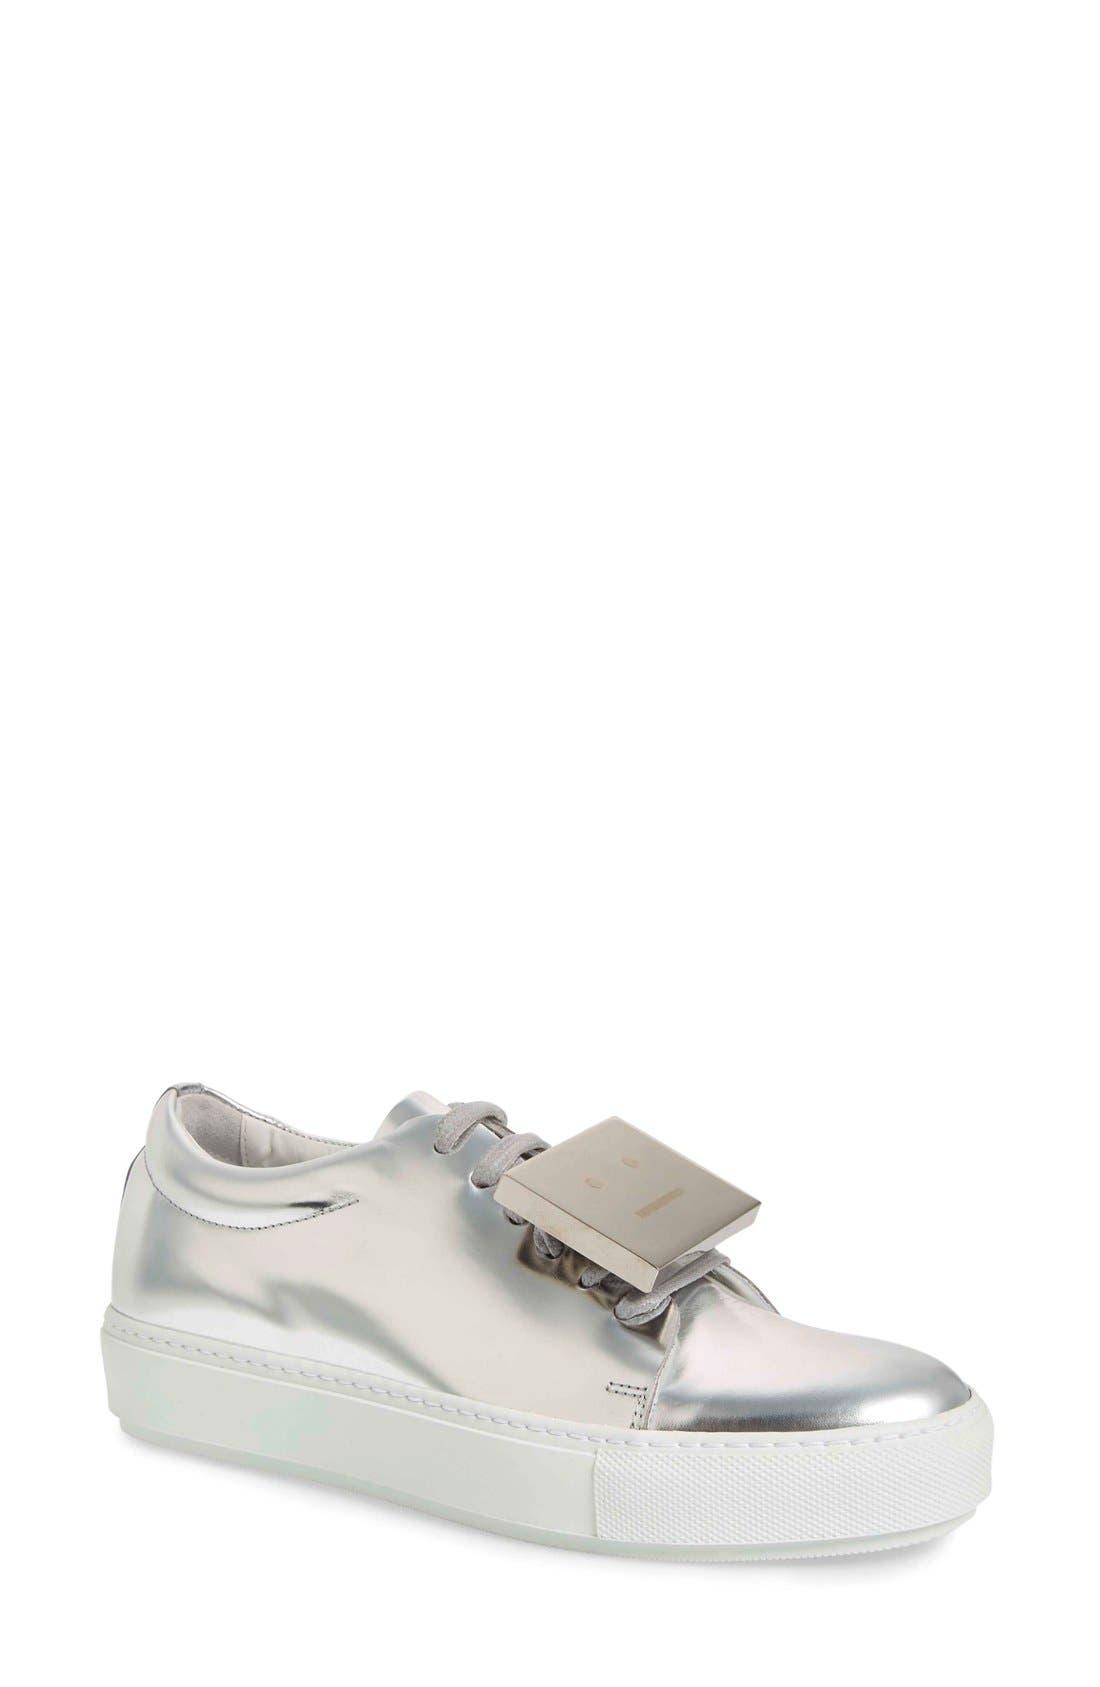 Adriana Silver Metallic Sneaker,                             Main thumbnail 1, color,                             044